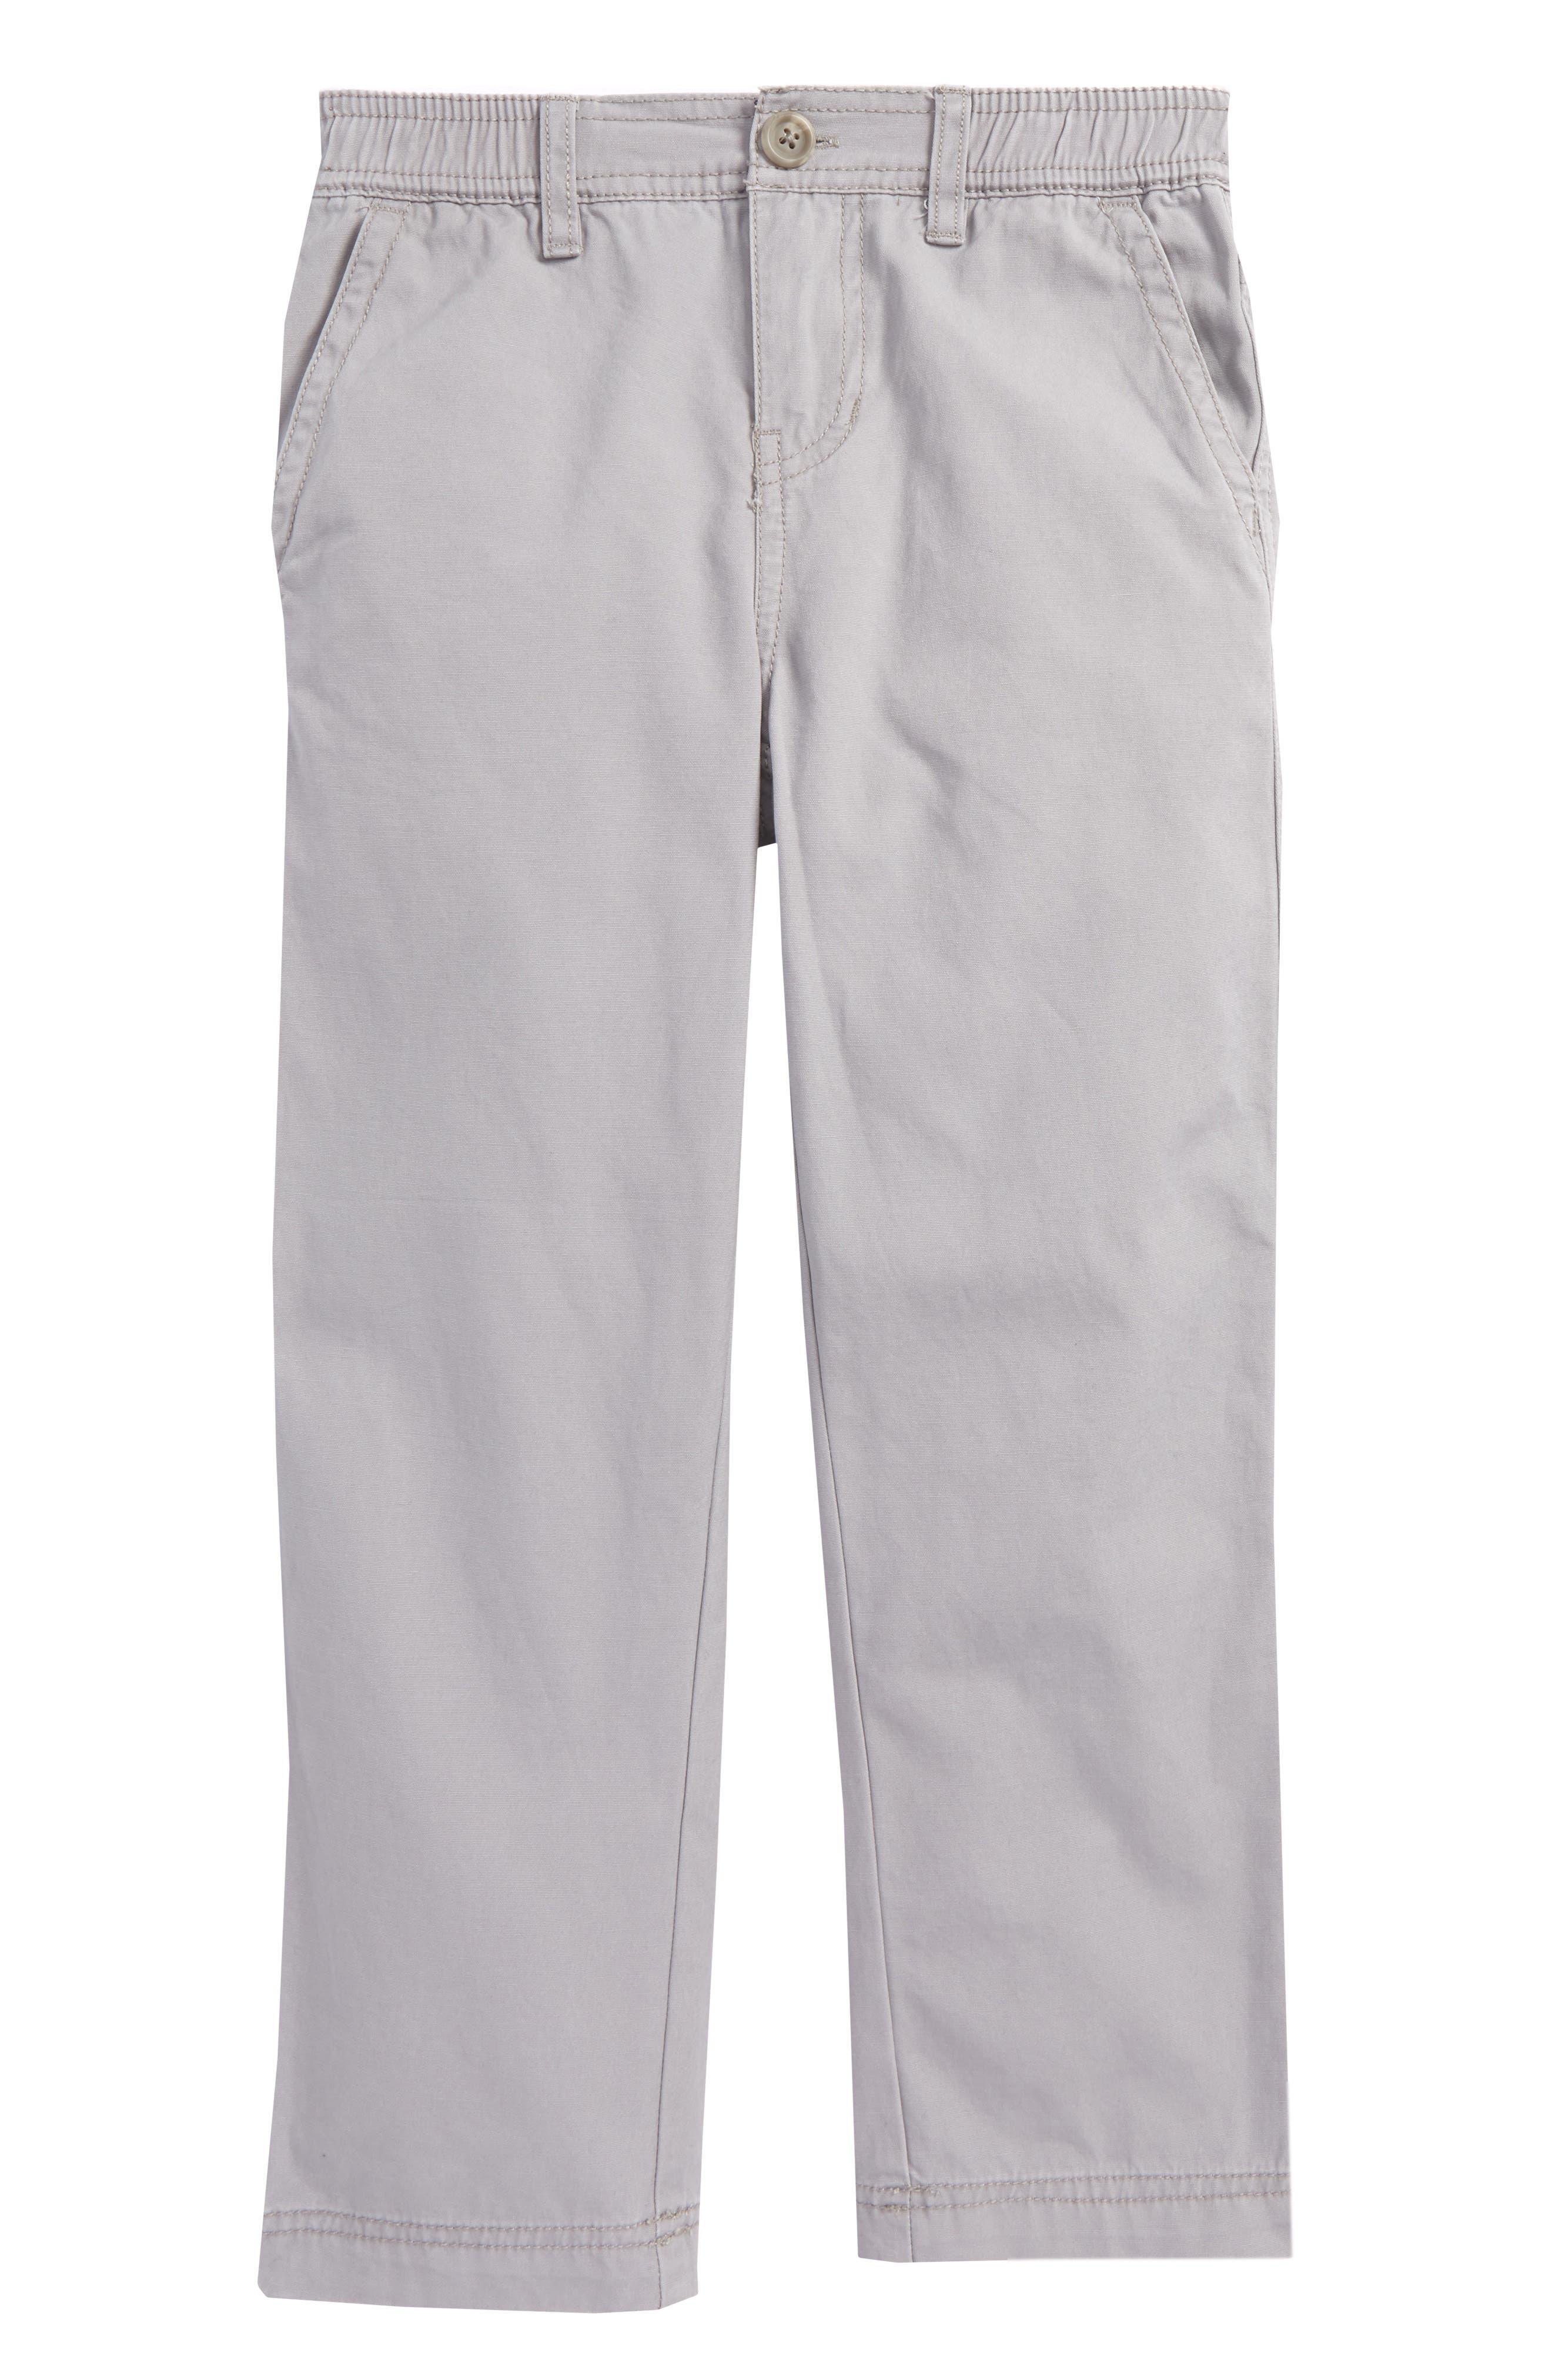 Tea Collection Cotton Pants (Toddler Boys & Little Boys)